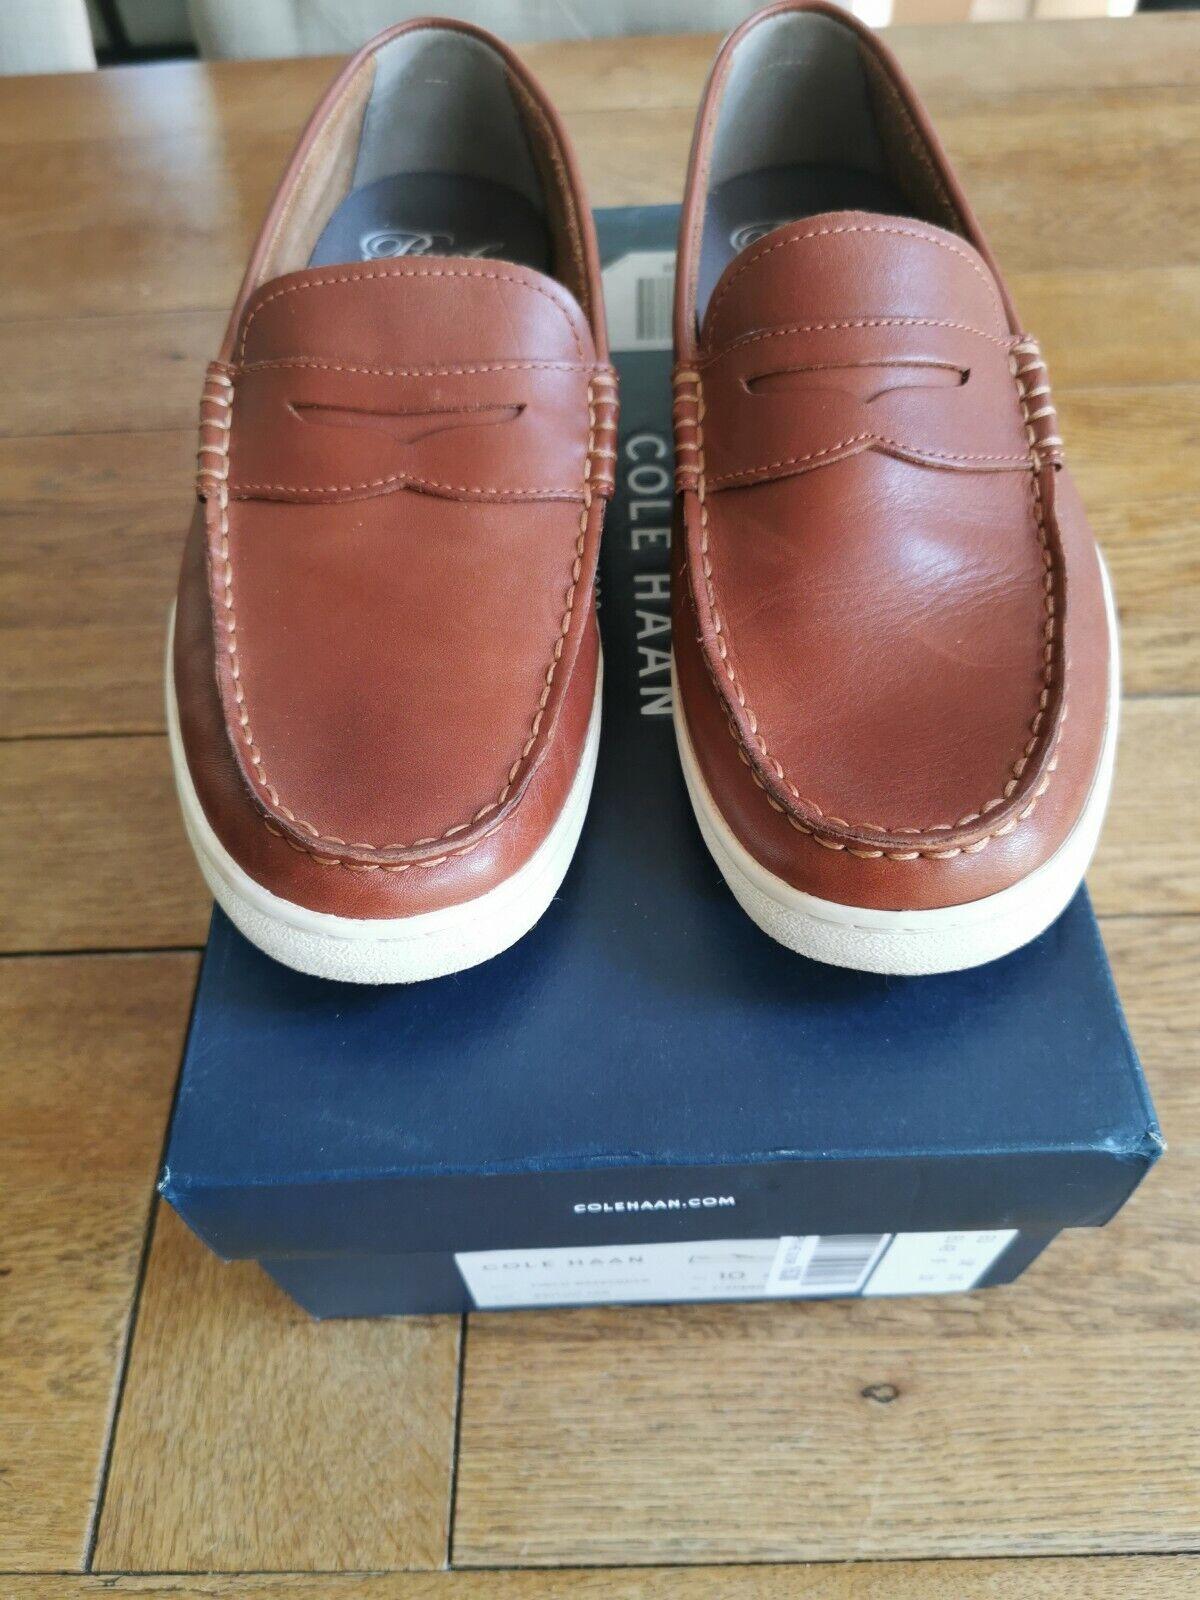 Cole Haan Mens Pinch Weekender Boat Shoes British Tan Brown UK 9 M EU43 US10